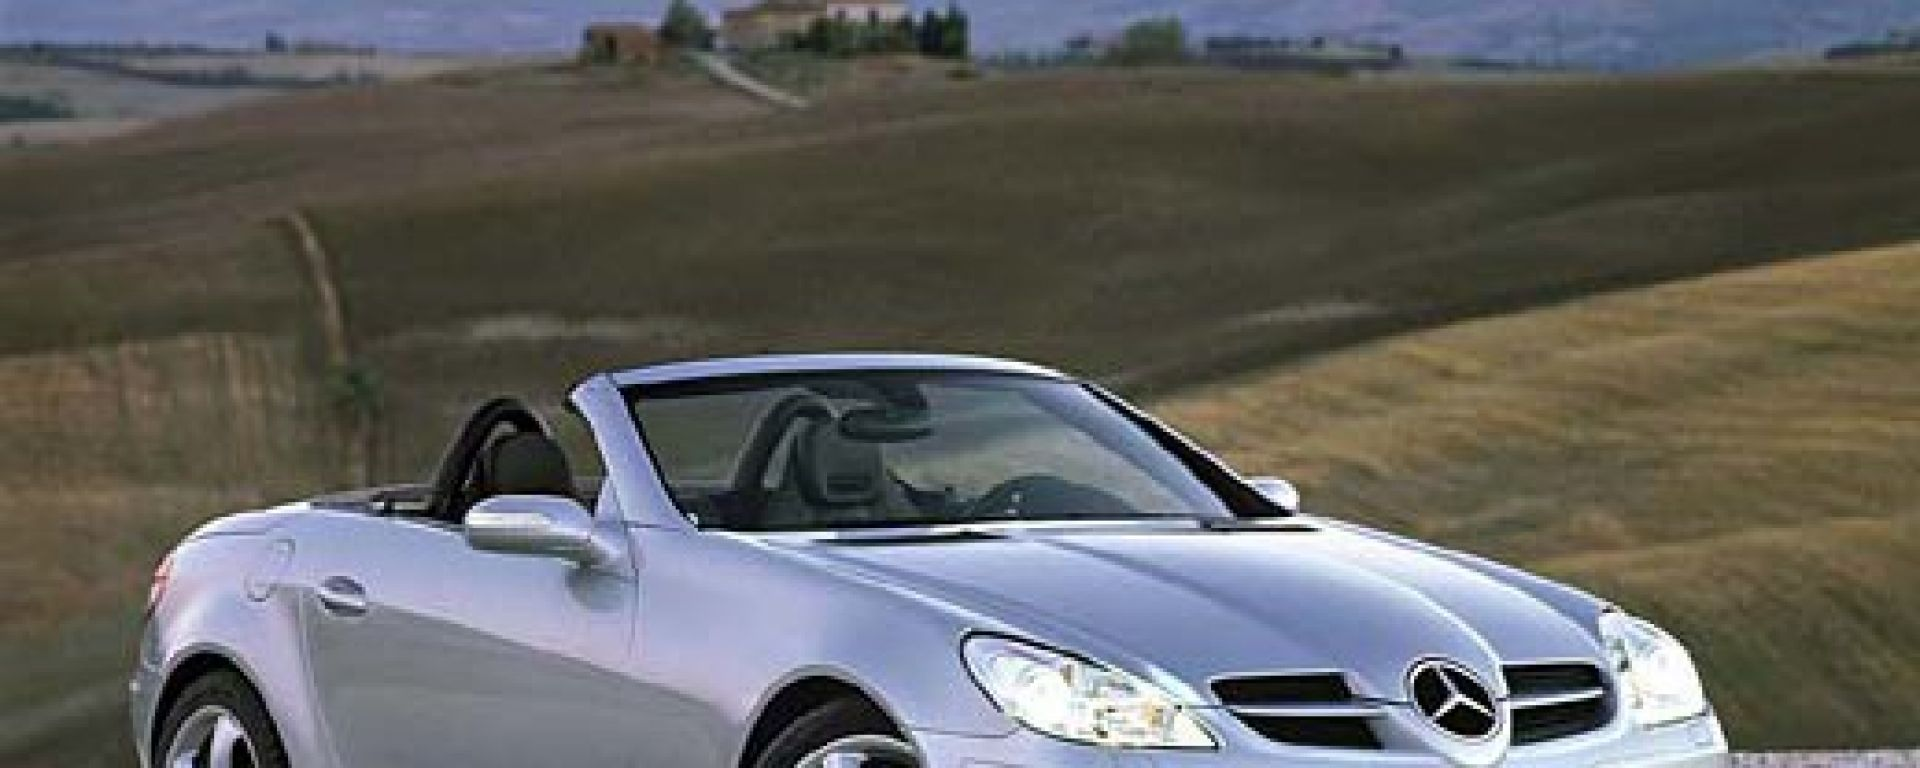 Anteprima:Mercedes SLK 2004